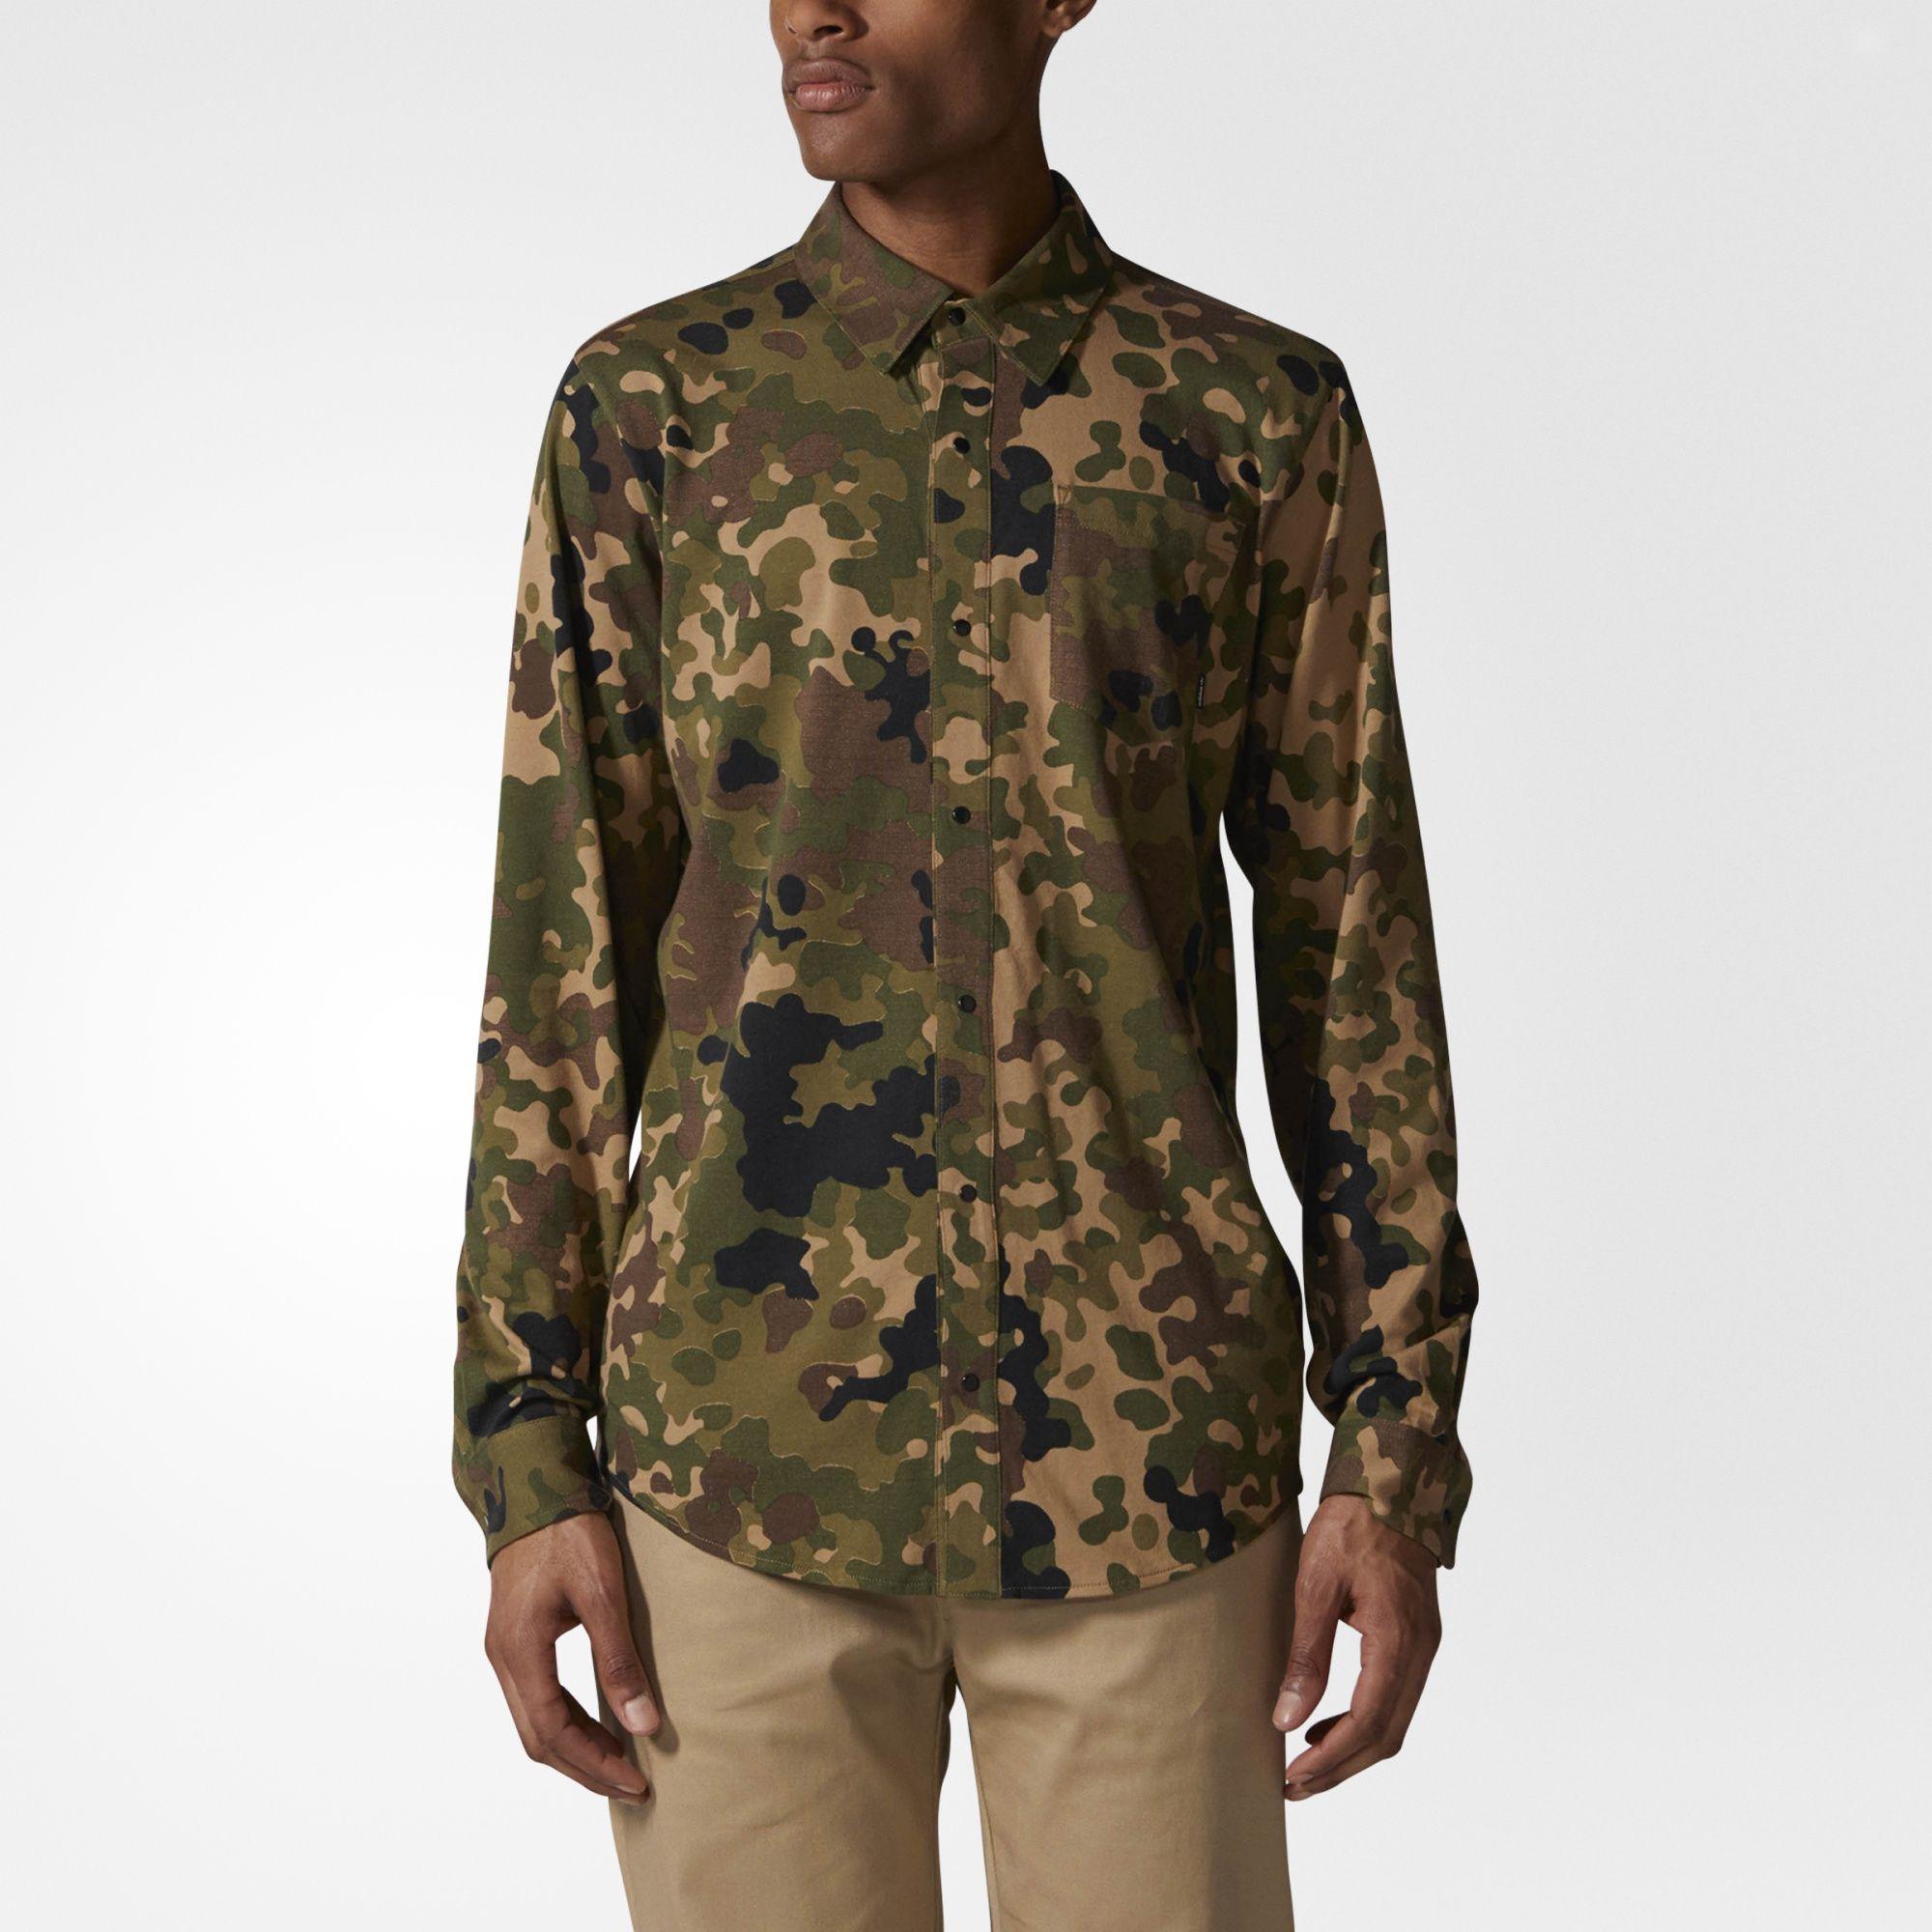 Flex Camouflage Shirt | Men's Fashion & Style | Camo shirts